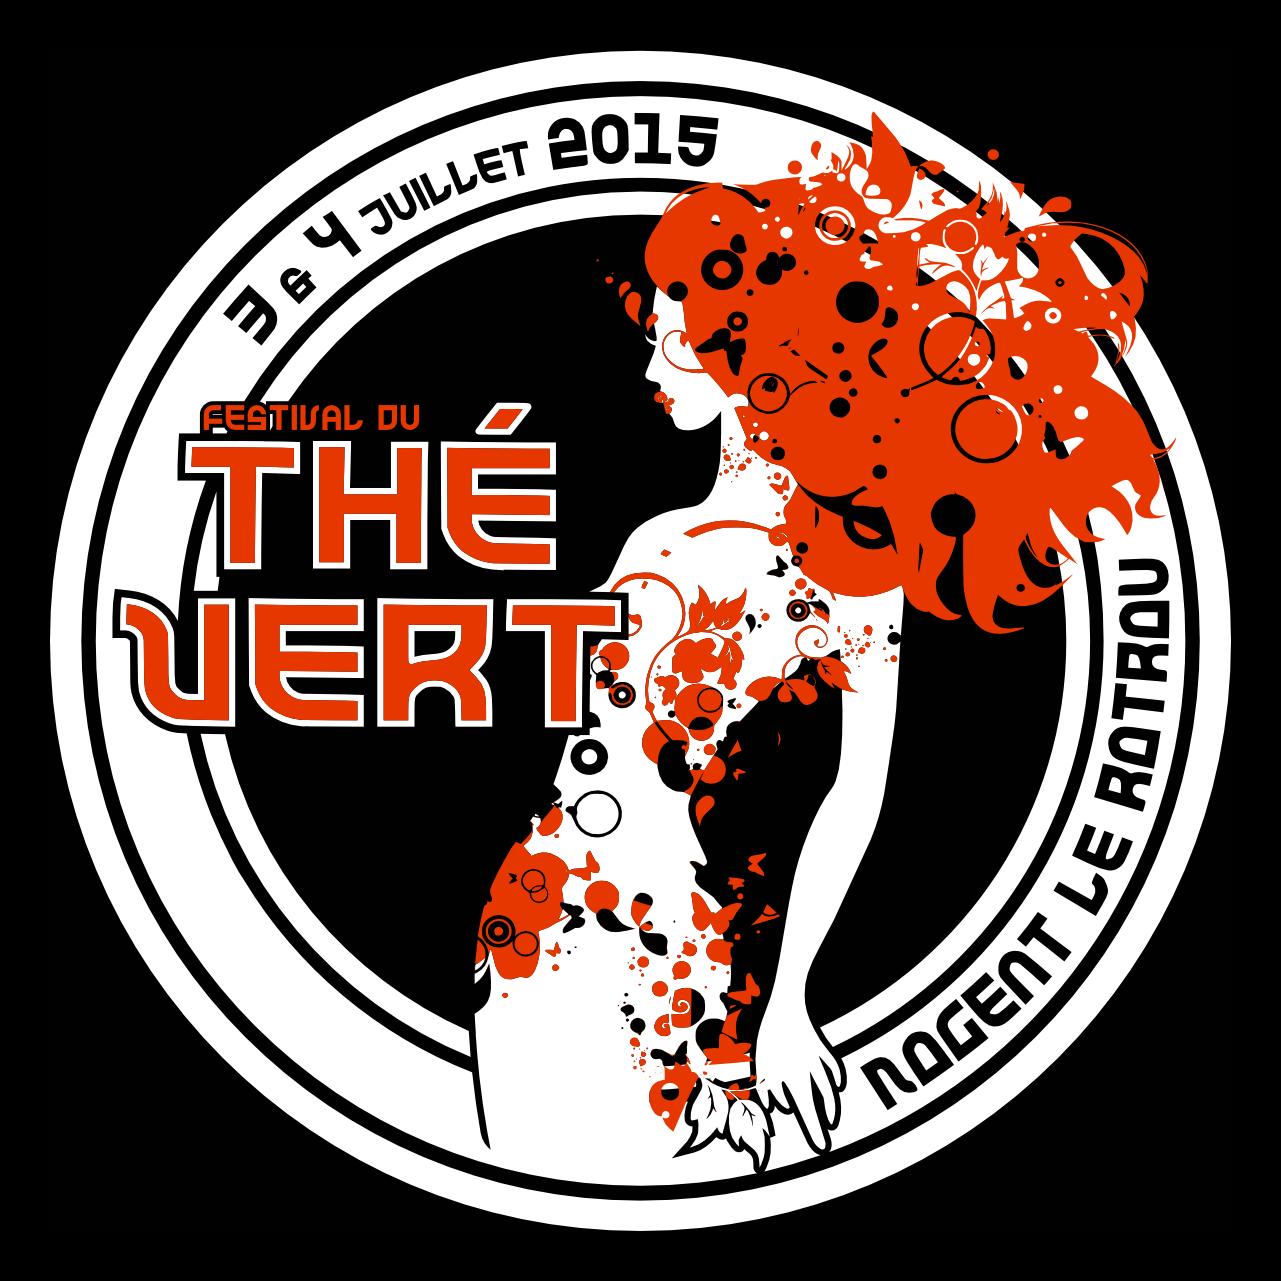 Festival du Thé Vert 2015 - Front T-Shirt